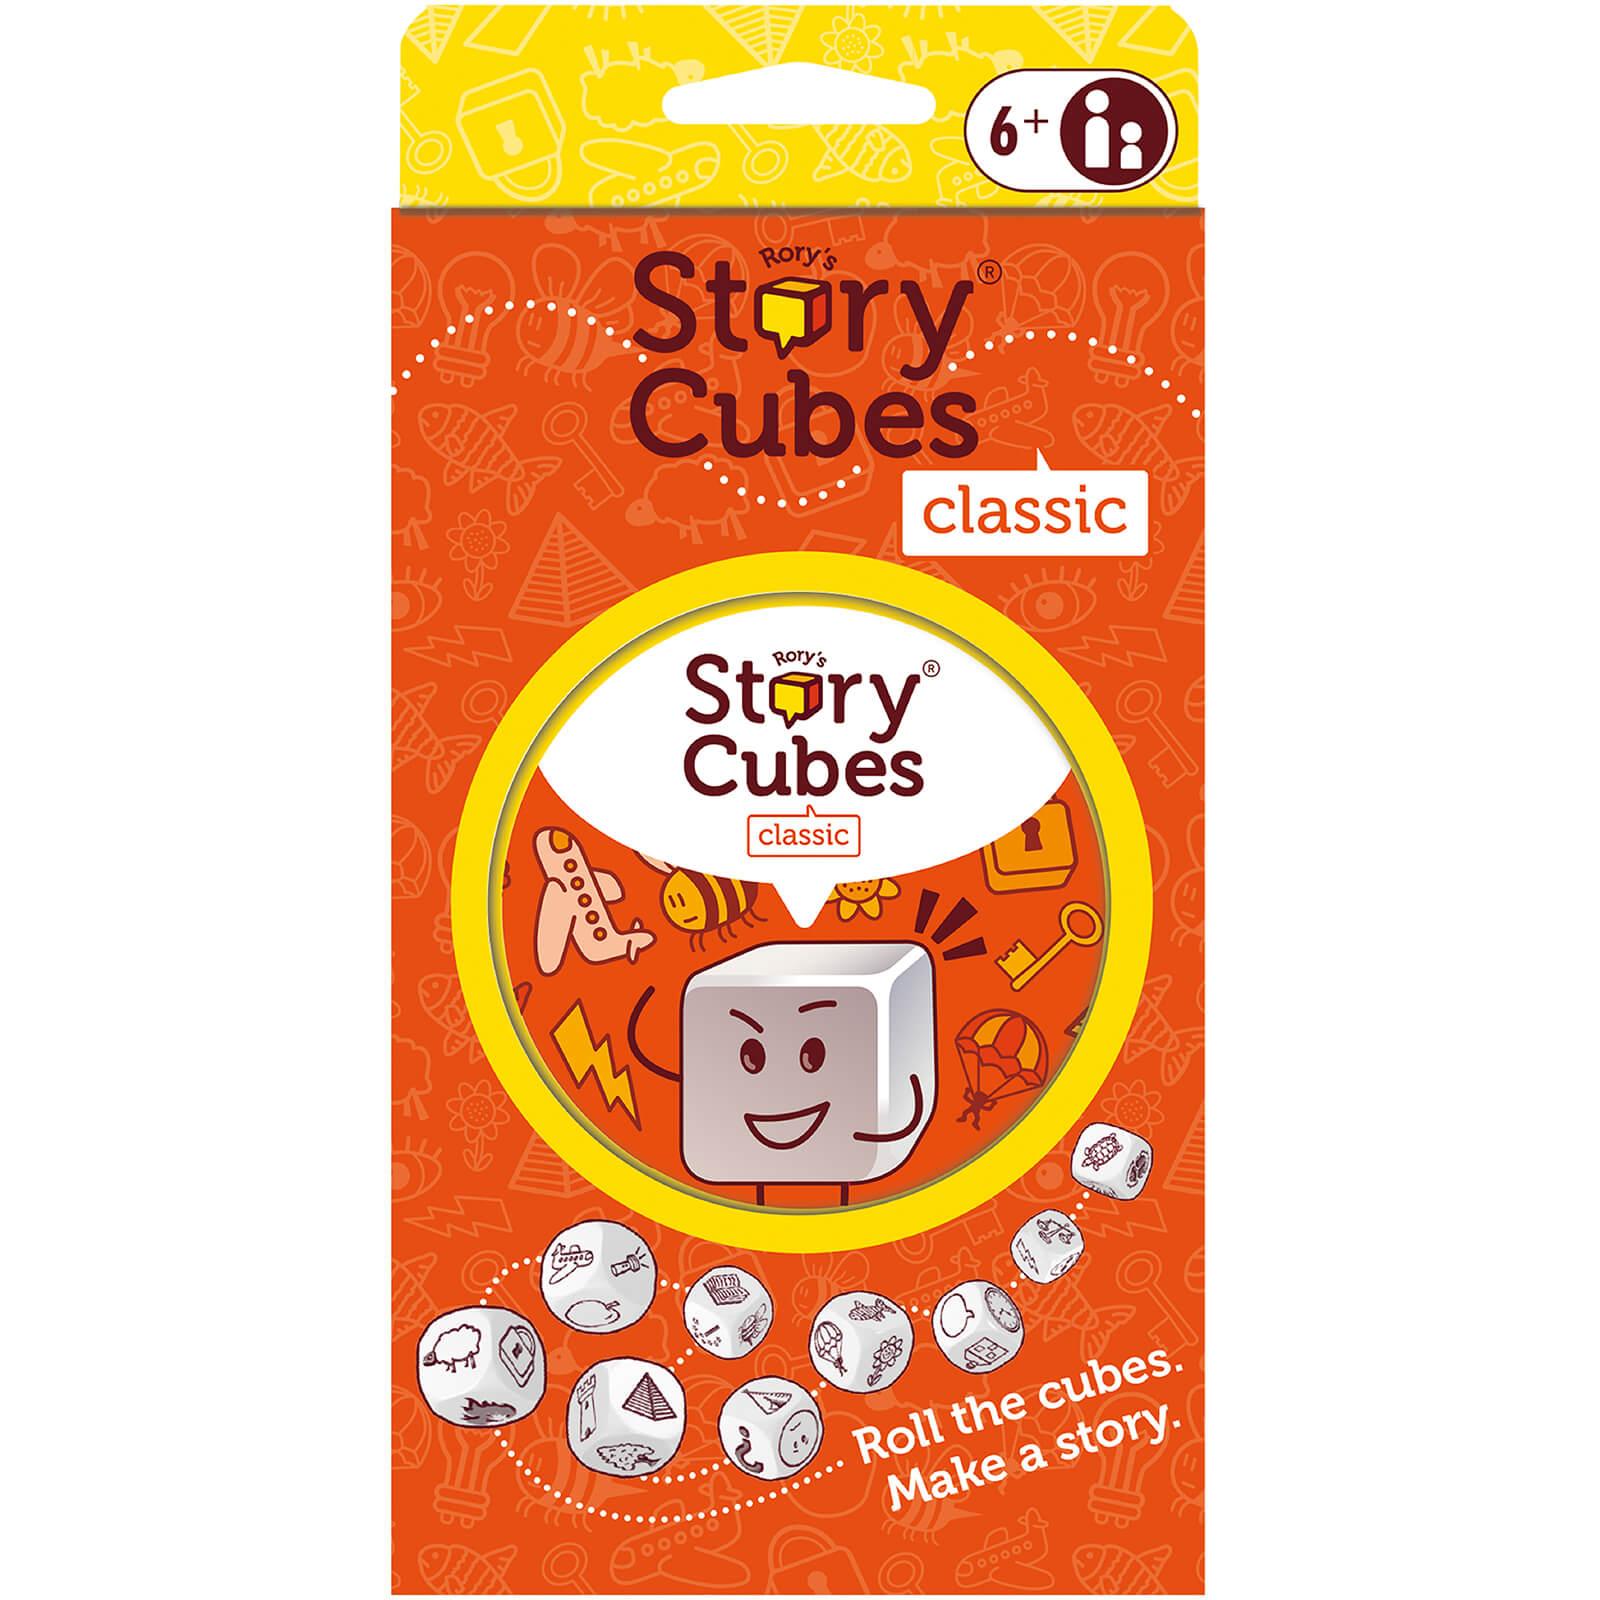 Rory's Story Cubes® - Original Edition